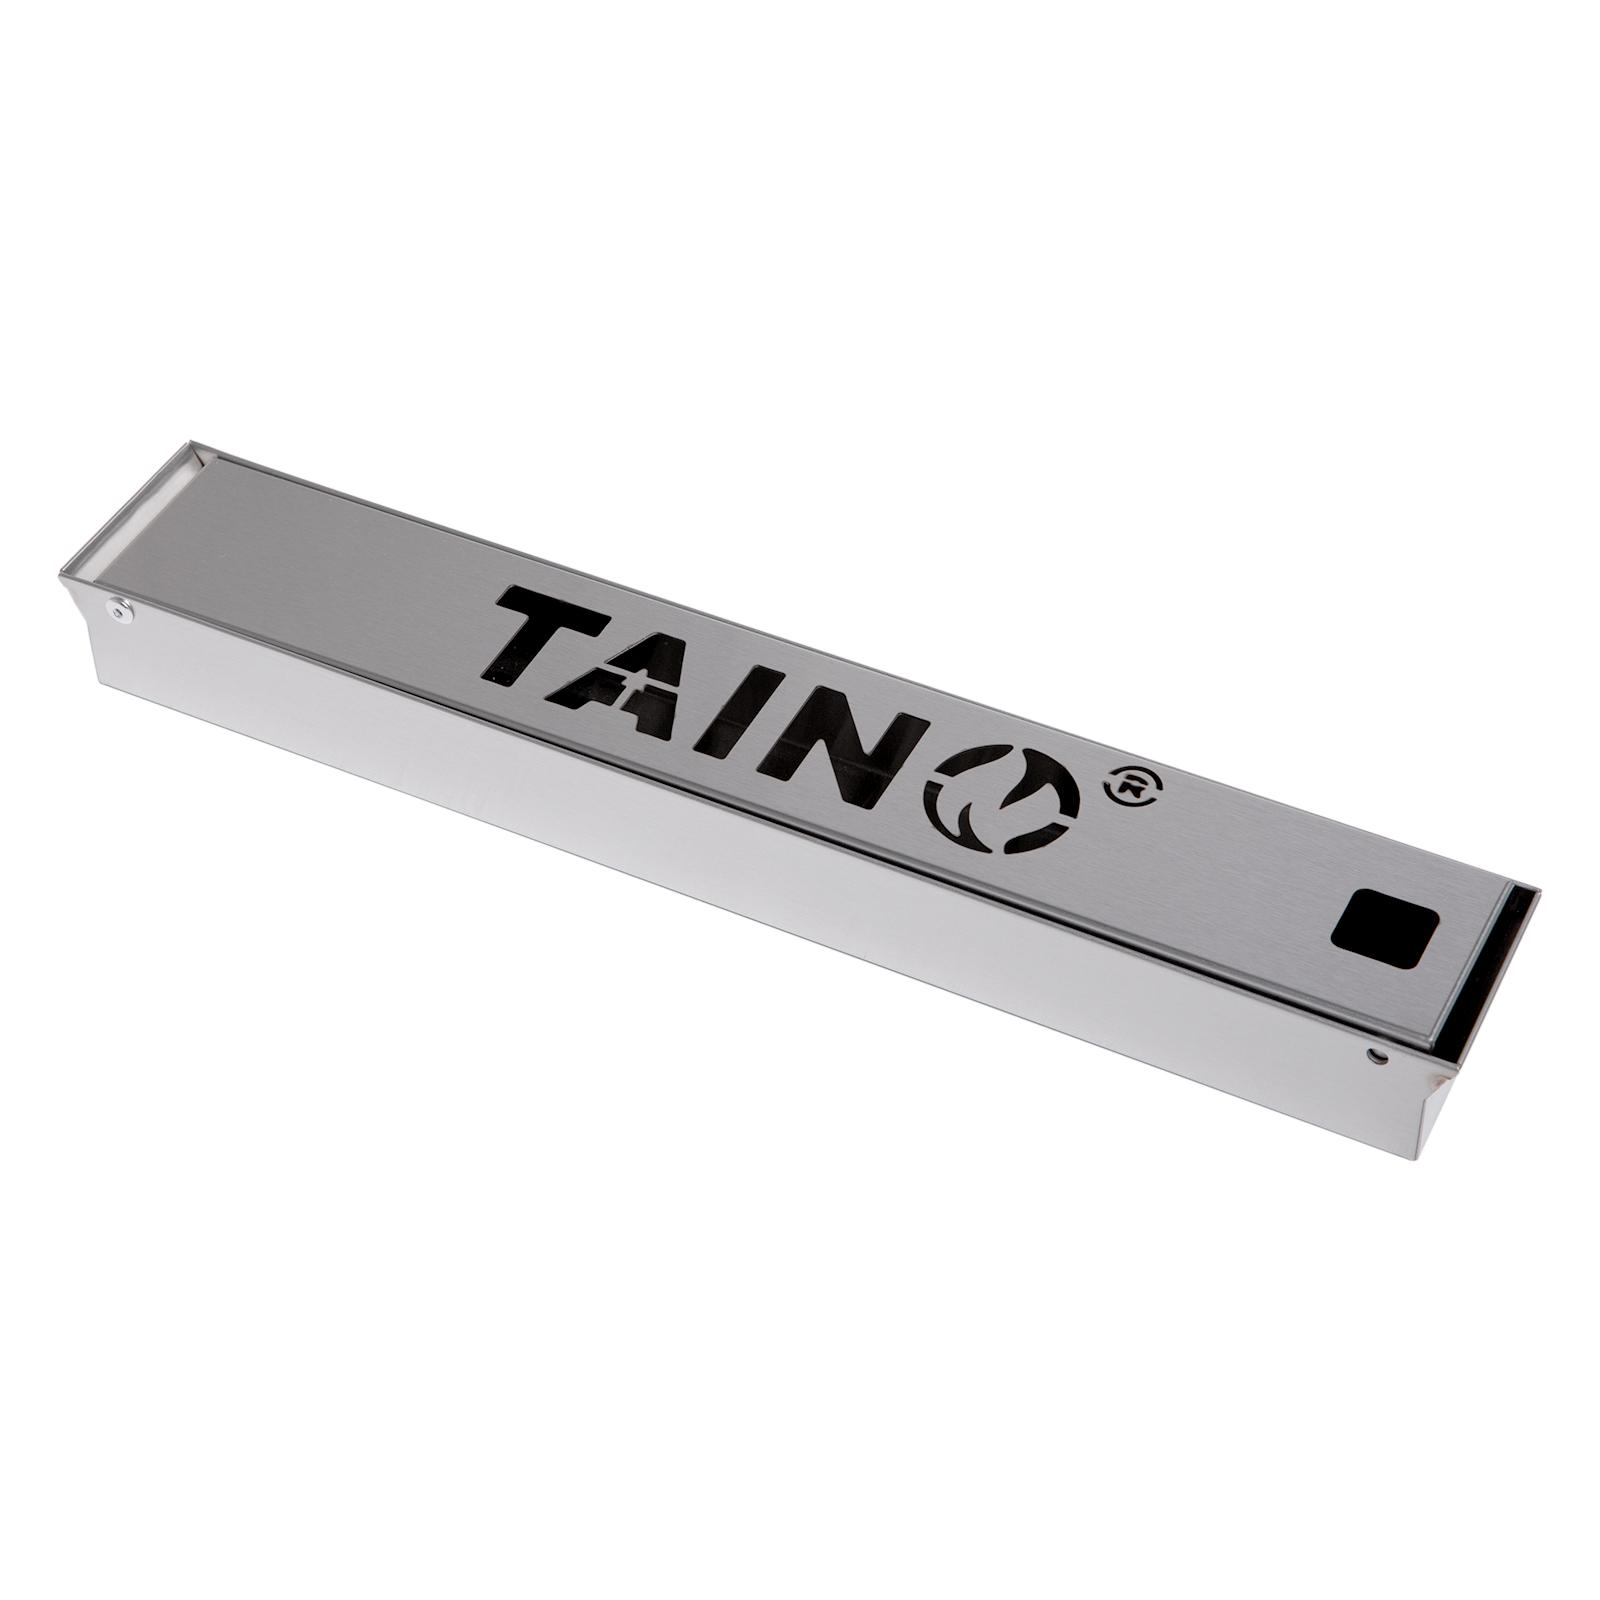 93578 TAINO Räucherbox aus Edelstahl Smokerbox Universal